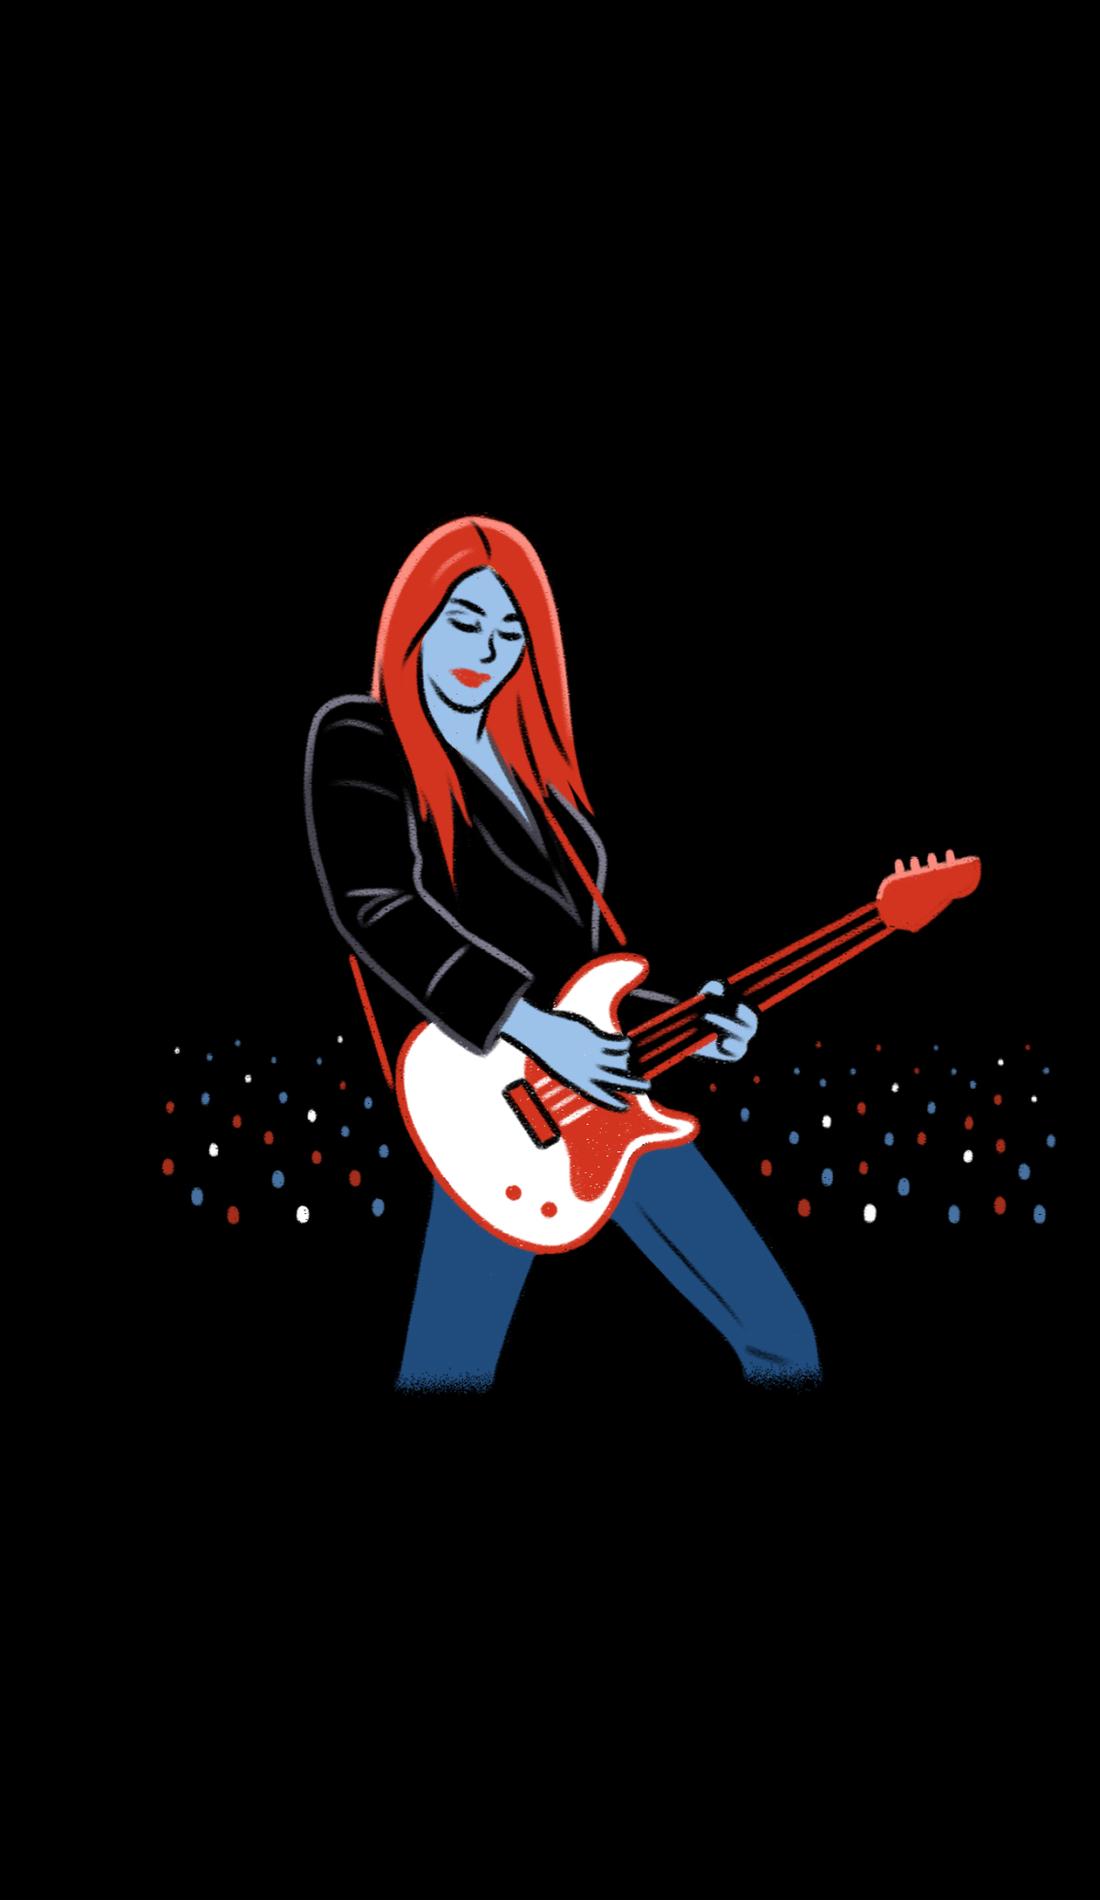 A Devastation Of The Nation Tour live event